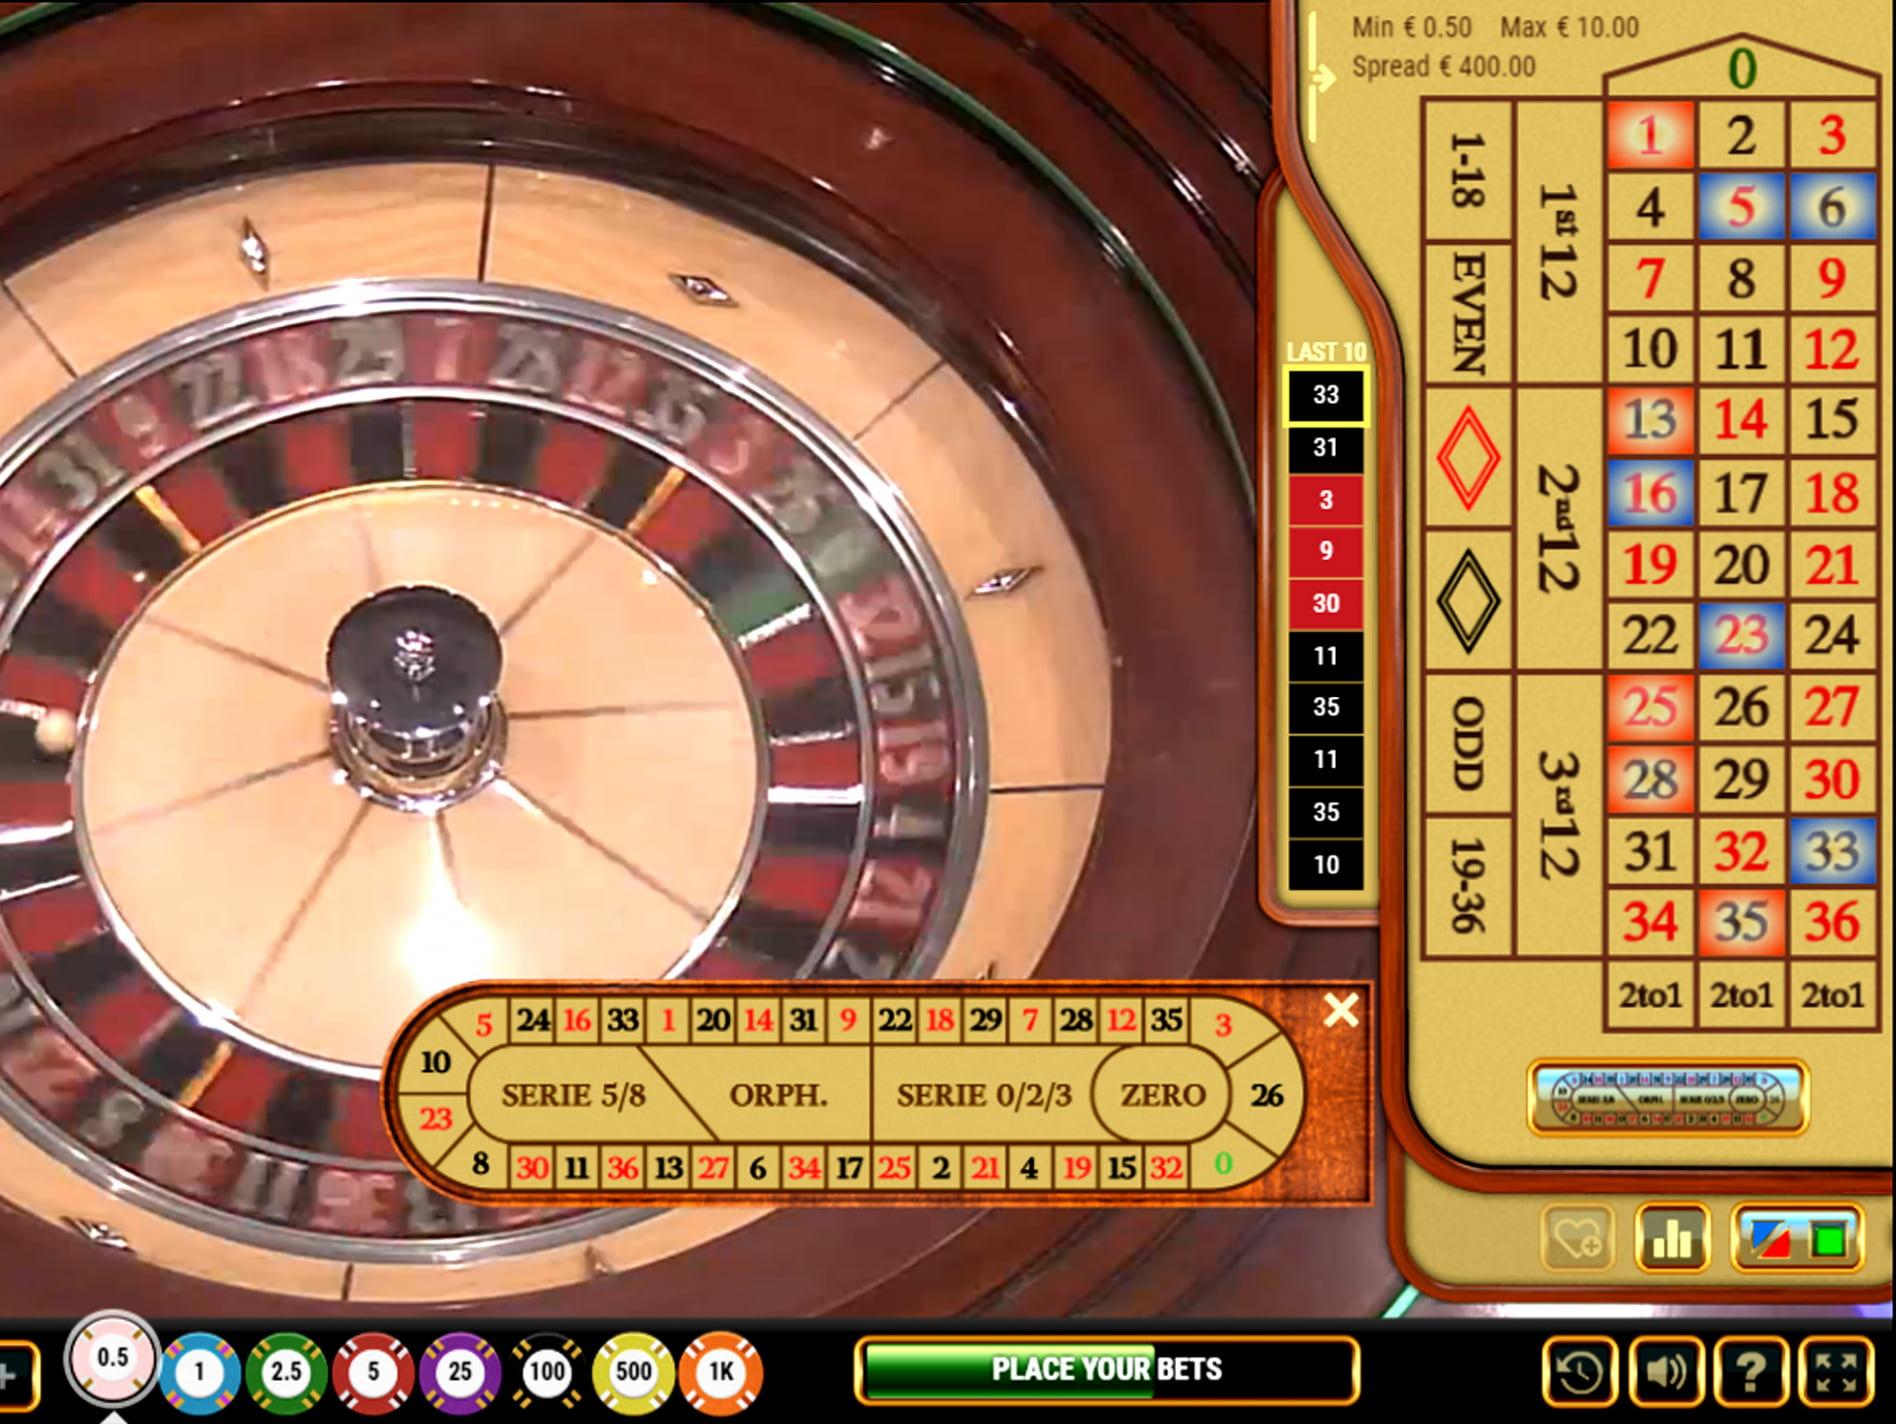 Apuestas fifa slots rascas ruleta-785822